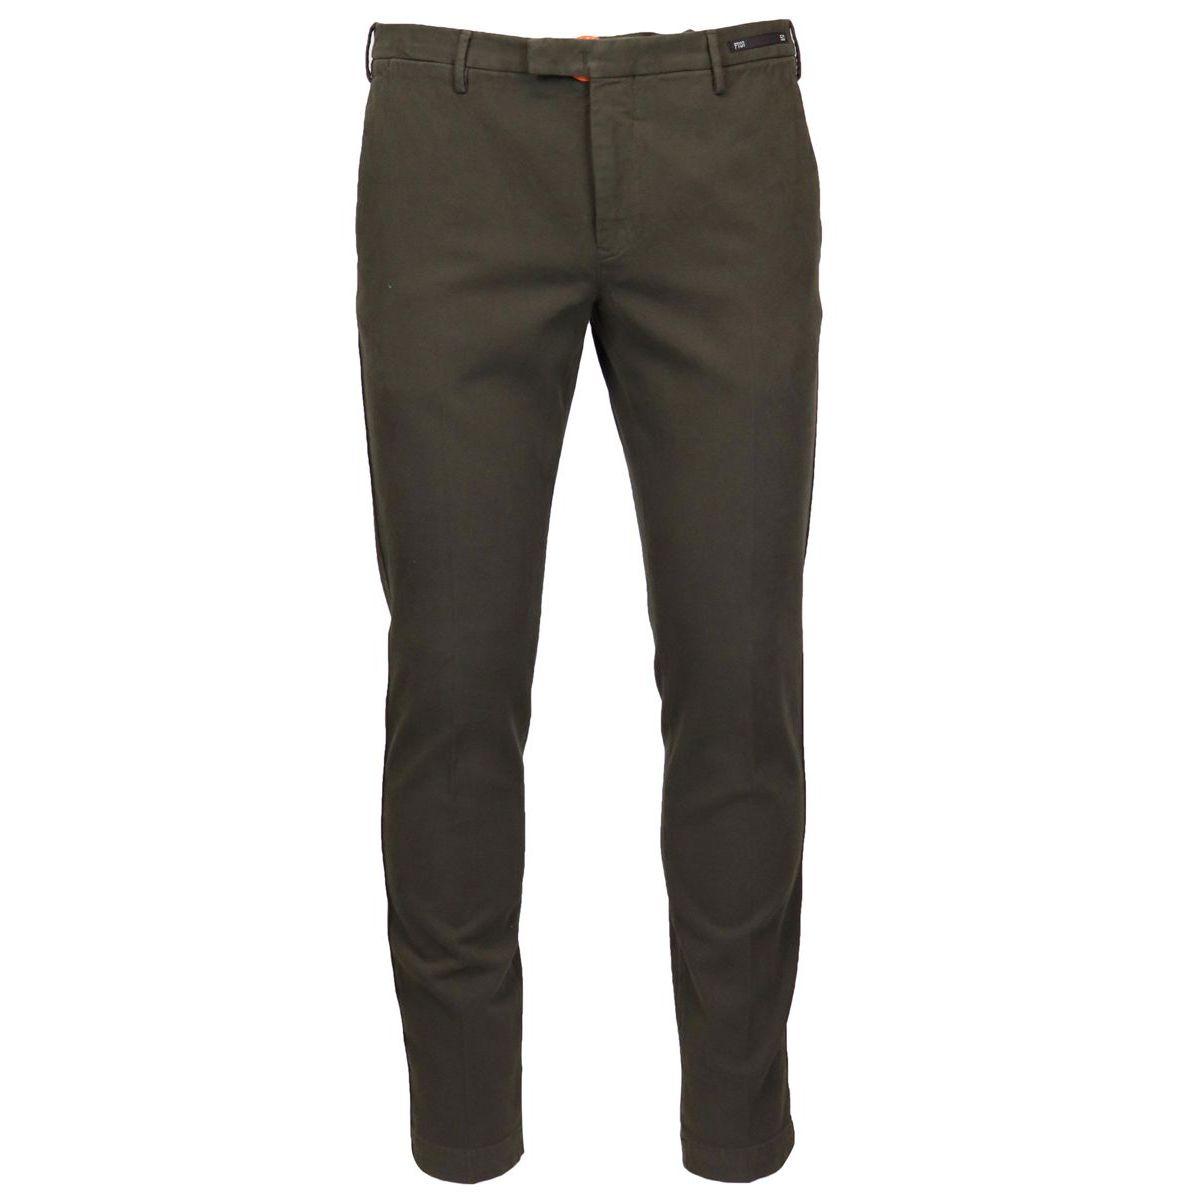 Solid color cotton skinny pants Brown PT01